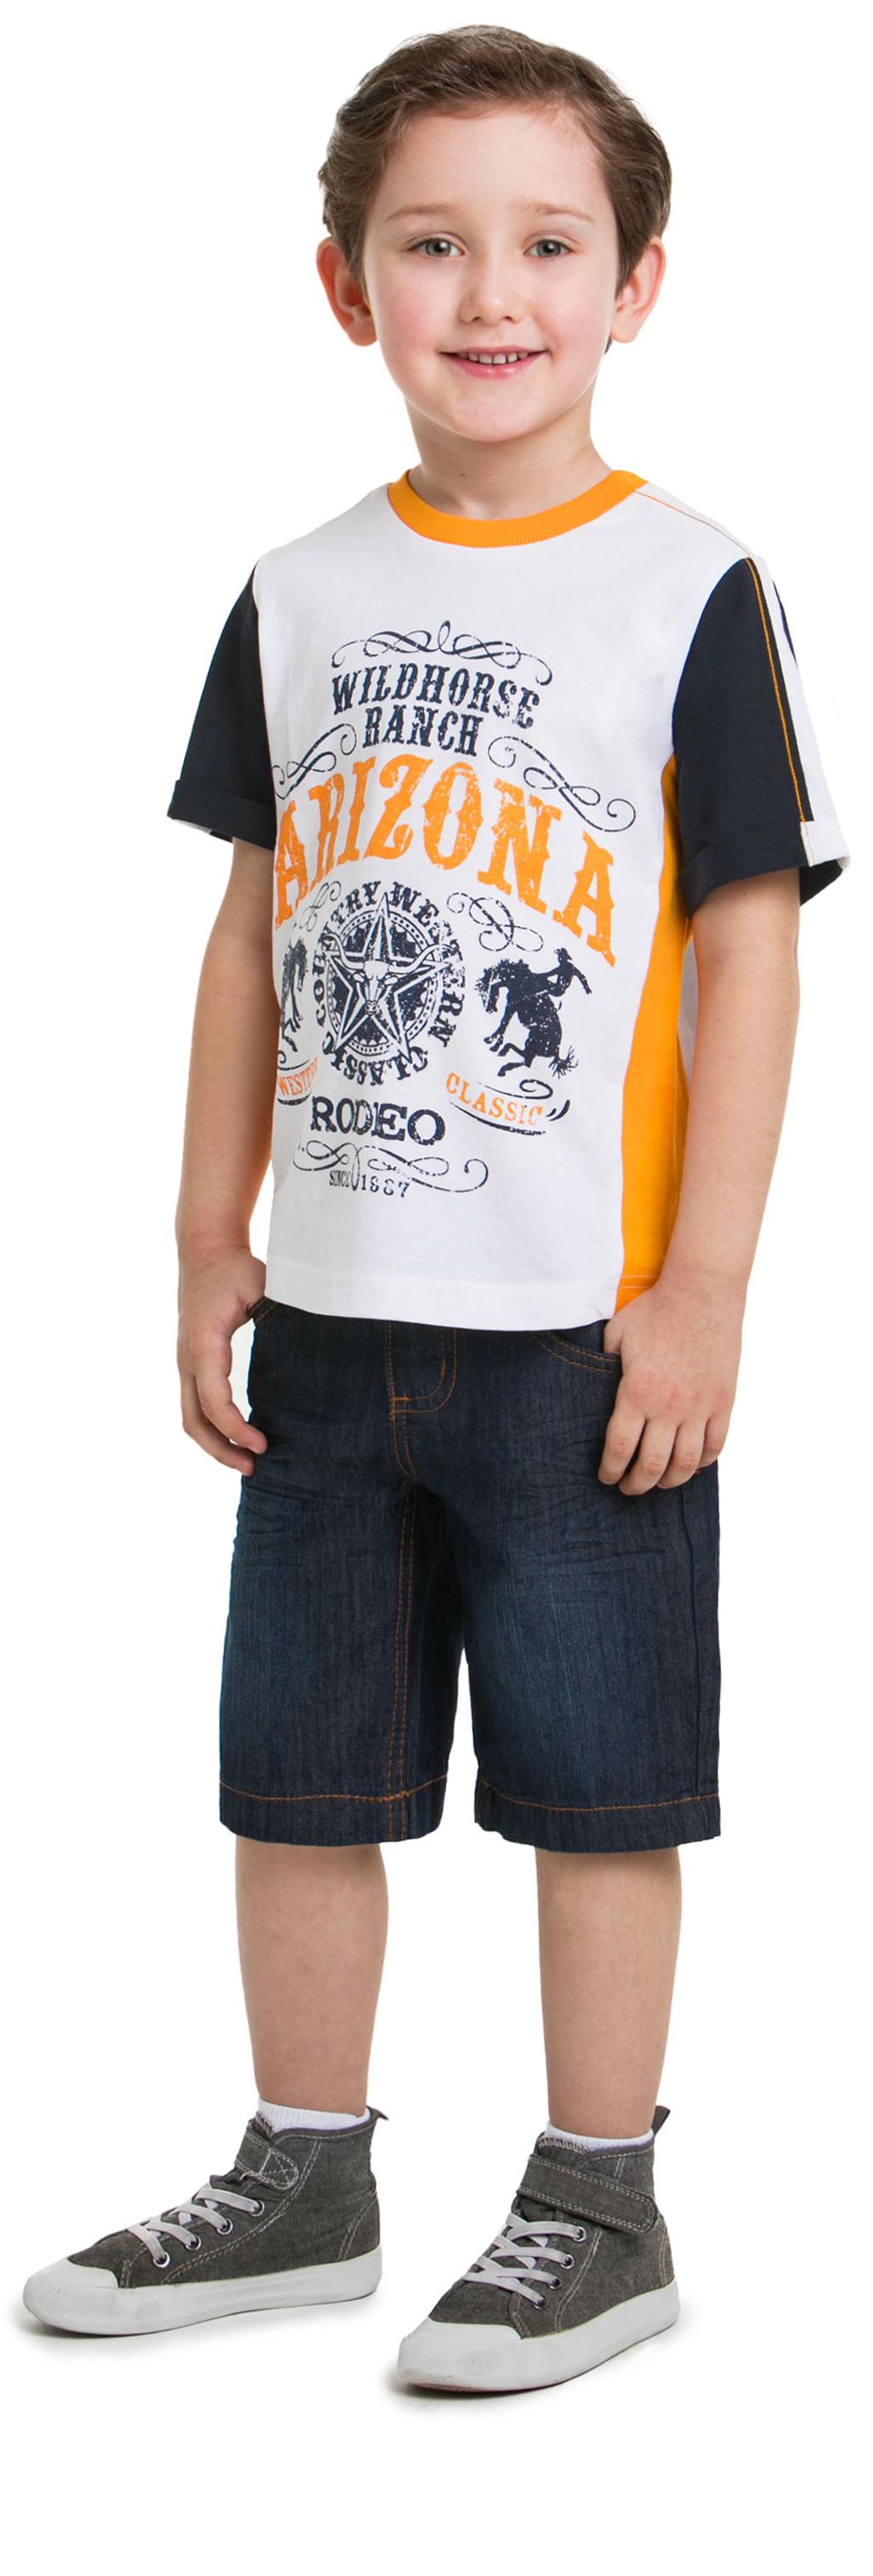 Футболка с коротким рукавом для мальчика Barkito Техас